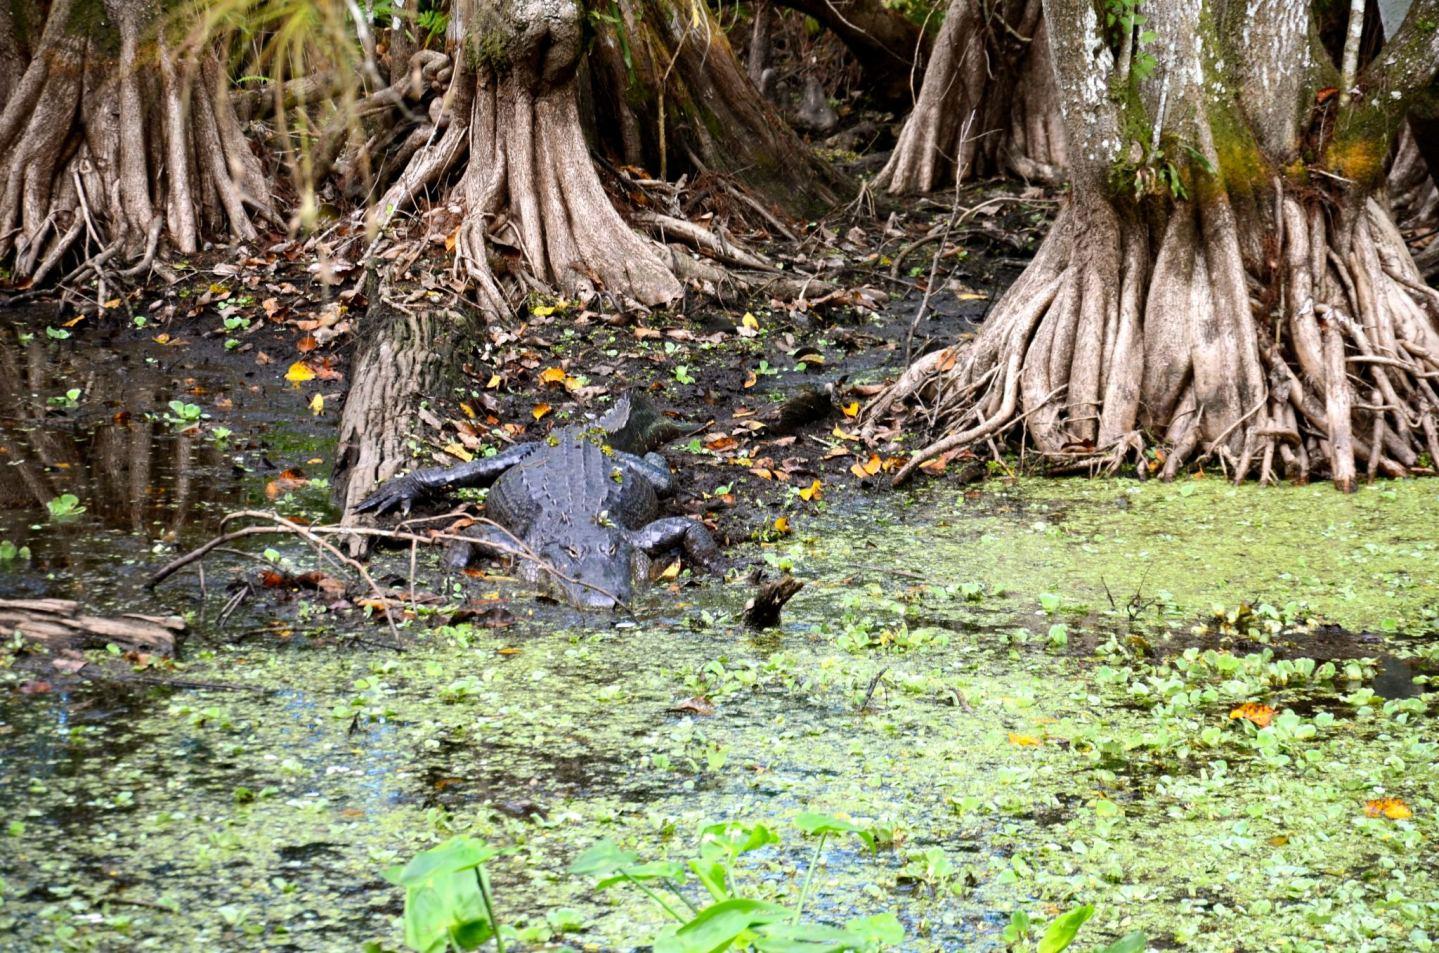 Corkscrew Swamp Sanctuary: A Wildlife Gem in Naples, Florida